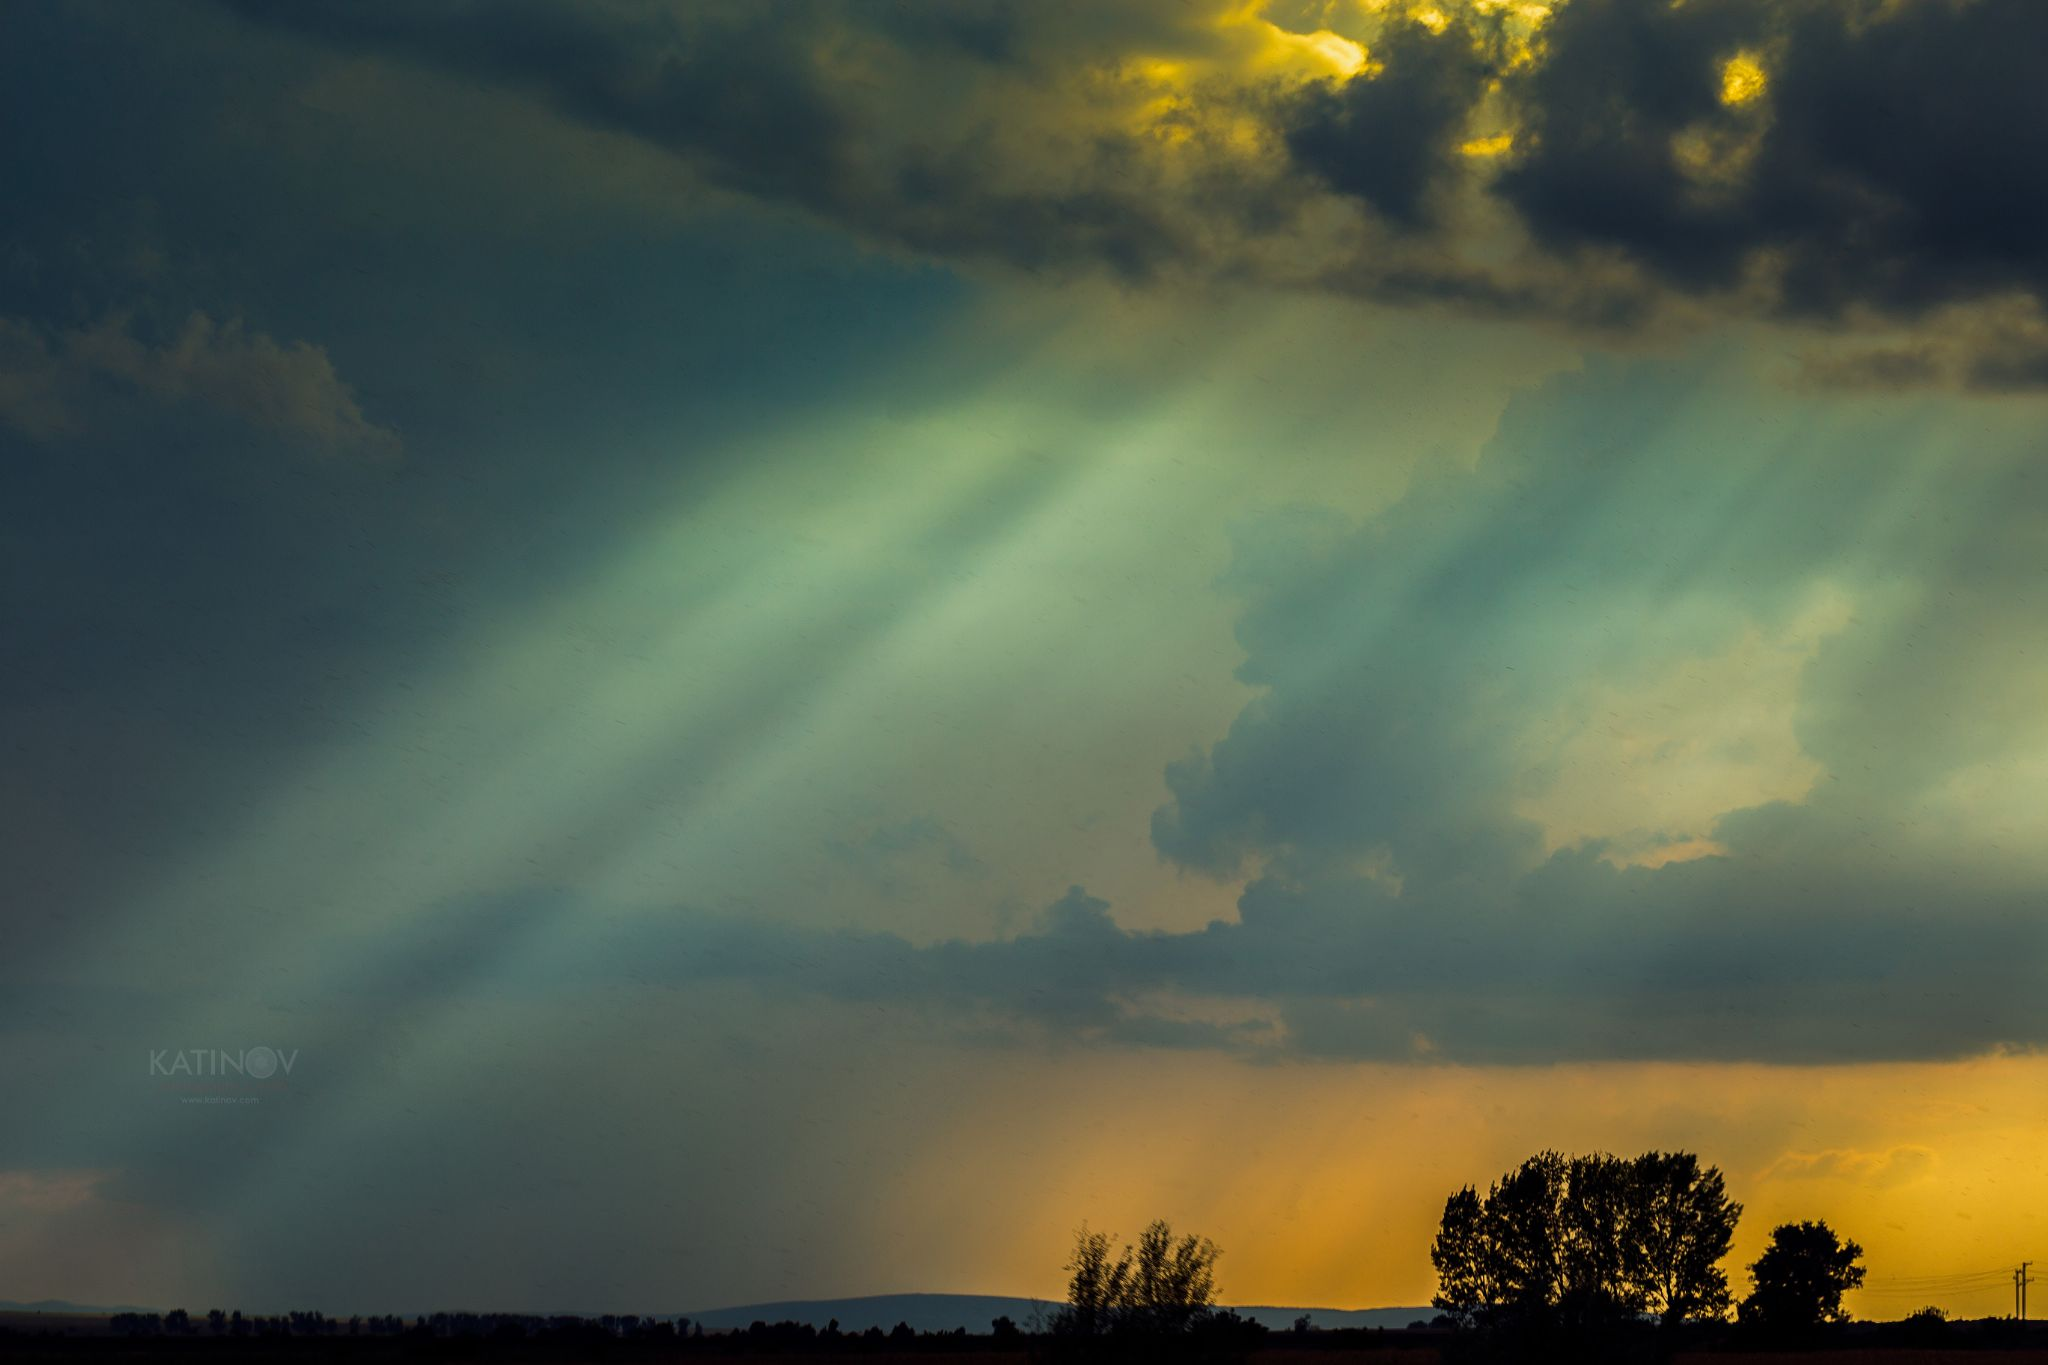 Sun rays by Stoyan Katinov